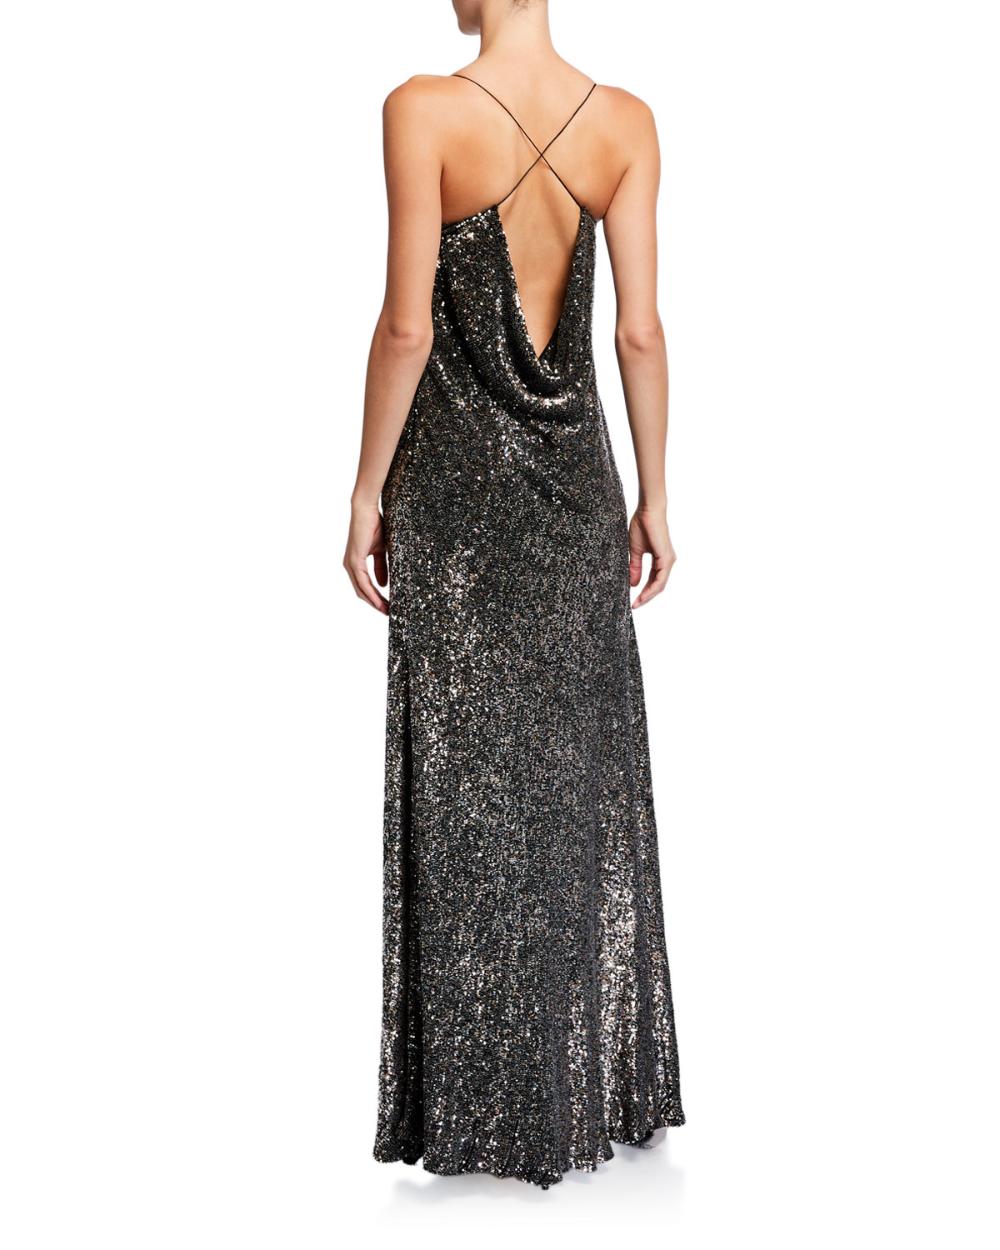 Elie Tahari Jazzie Metallic Cowl Neck Sleeveless Gown Metallic Cocktail Dresses Sleeveless Gown Camisole Dress [ 1250 x 1000 Pixel ]